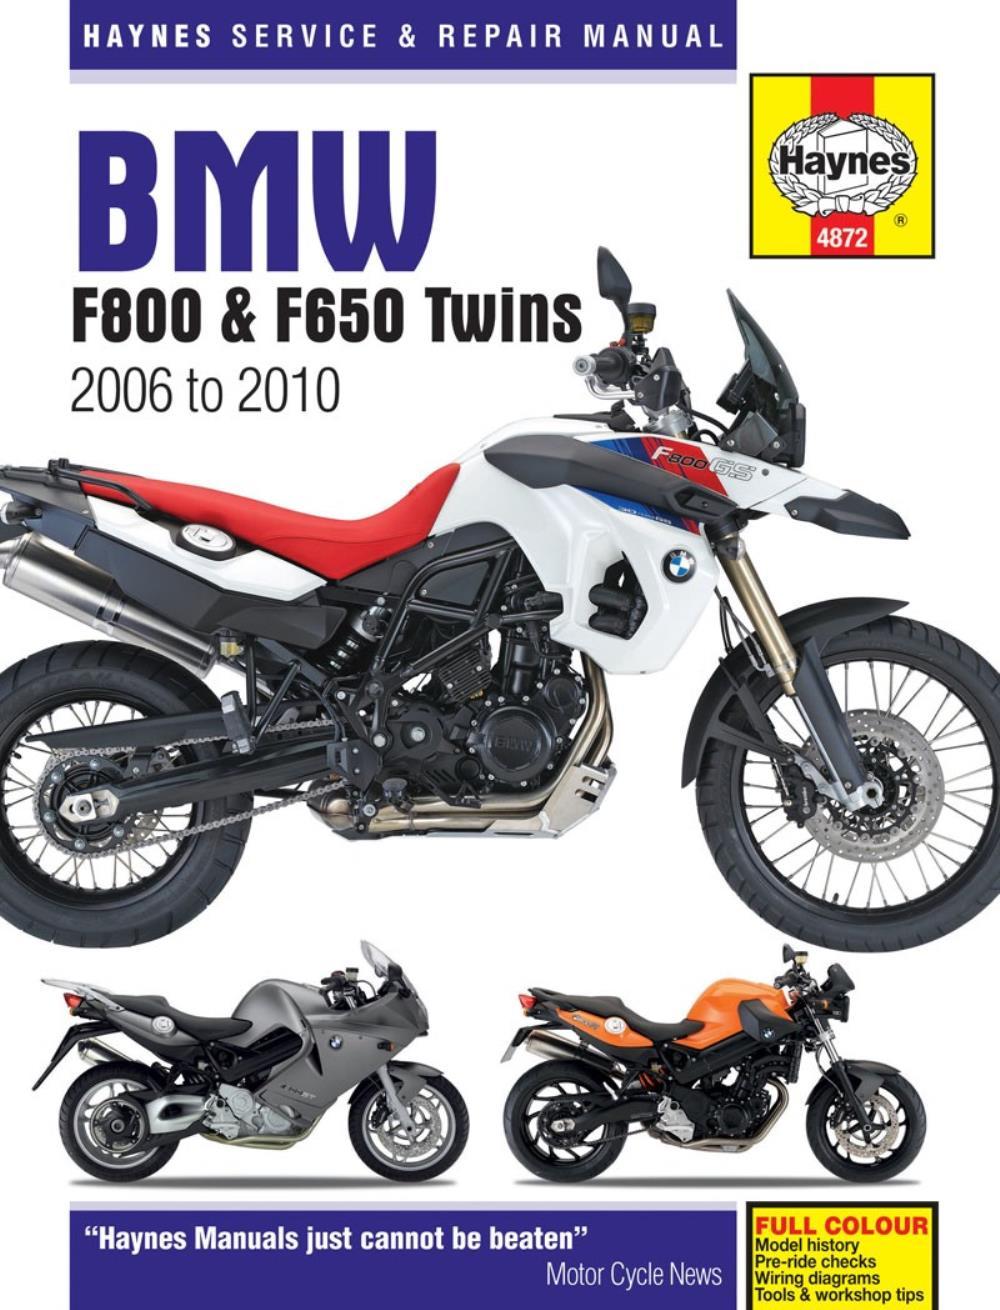 Manual Haynes For 2009 Bmw F 800 S Ebay